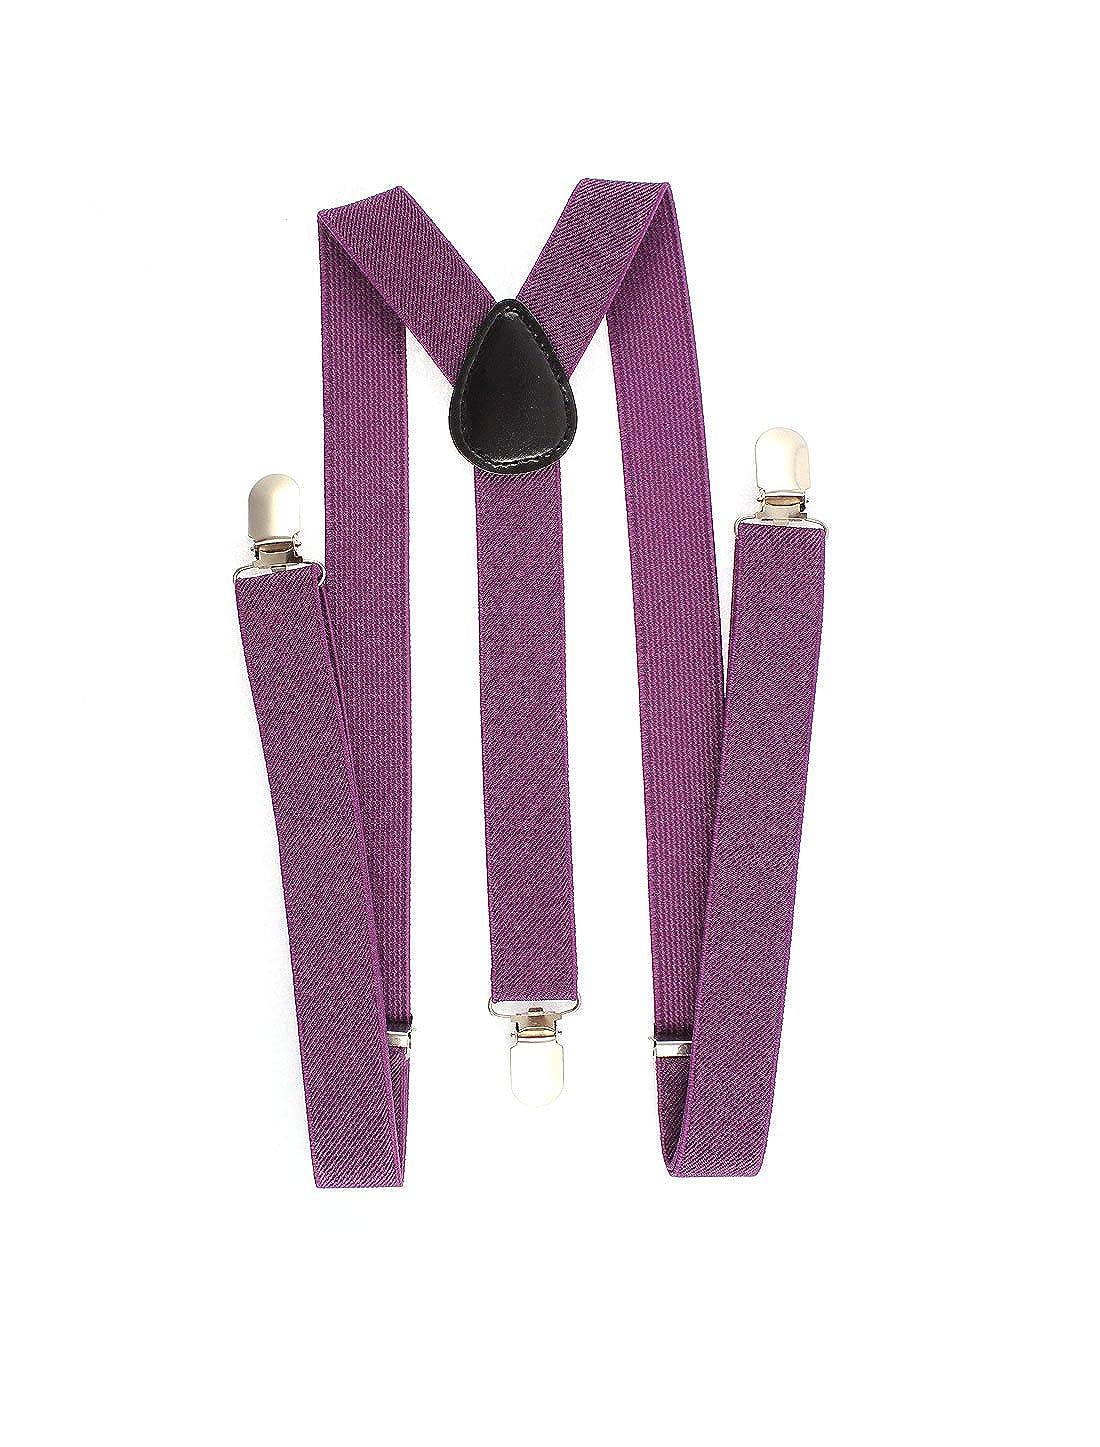 sourcingmap/® Signora donna 2.4cm regolabile ampia fascetta metallica elastica bretelle Calze autoreggenti bianco